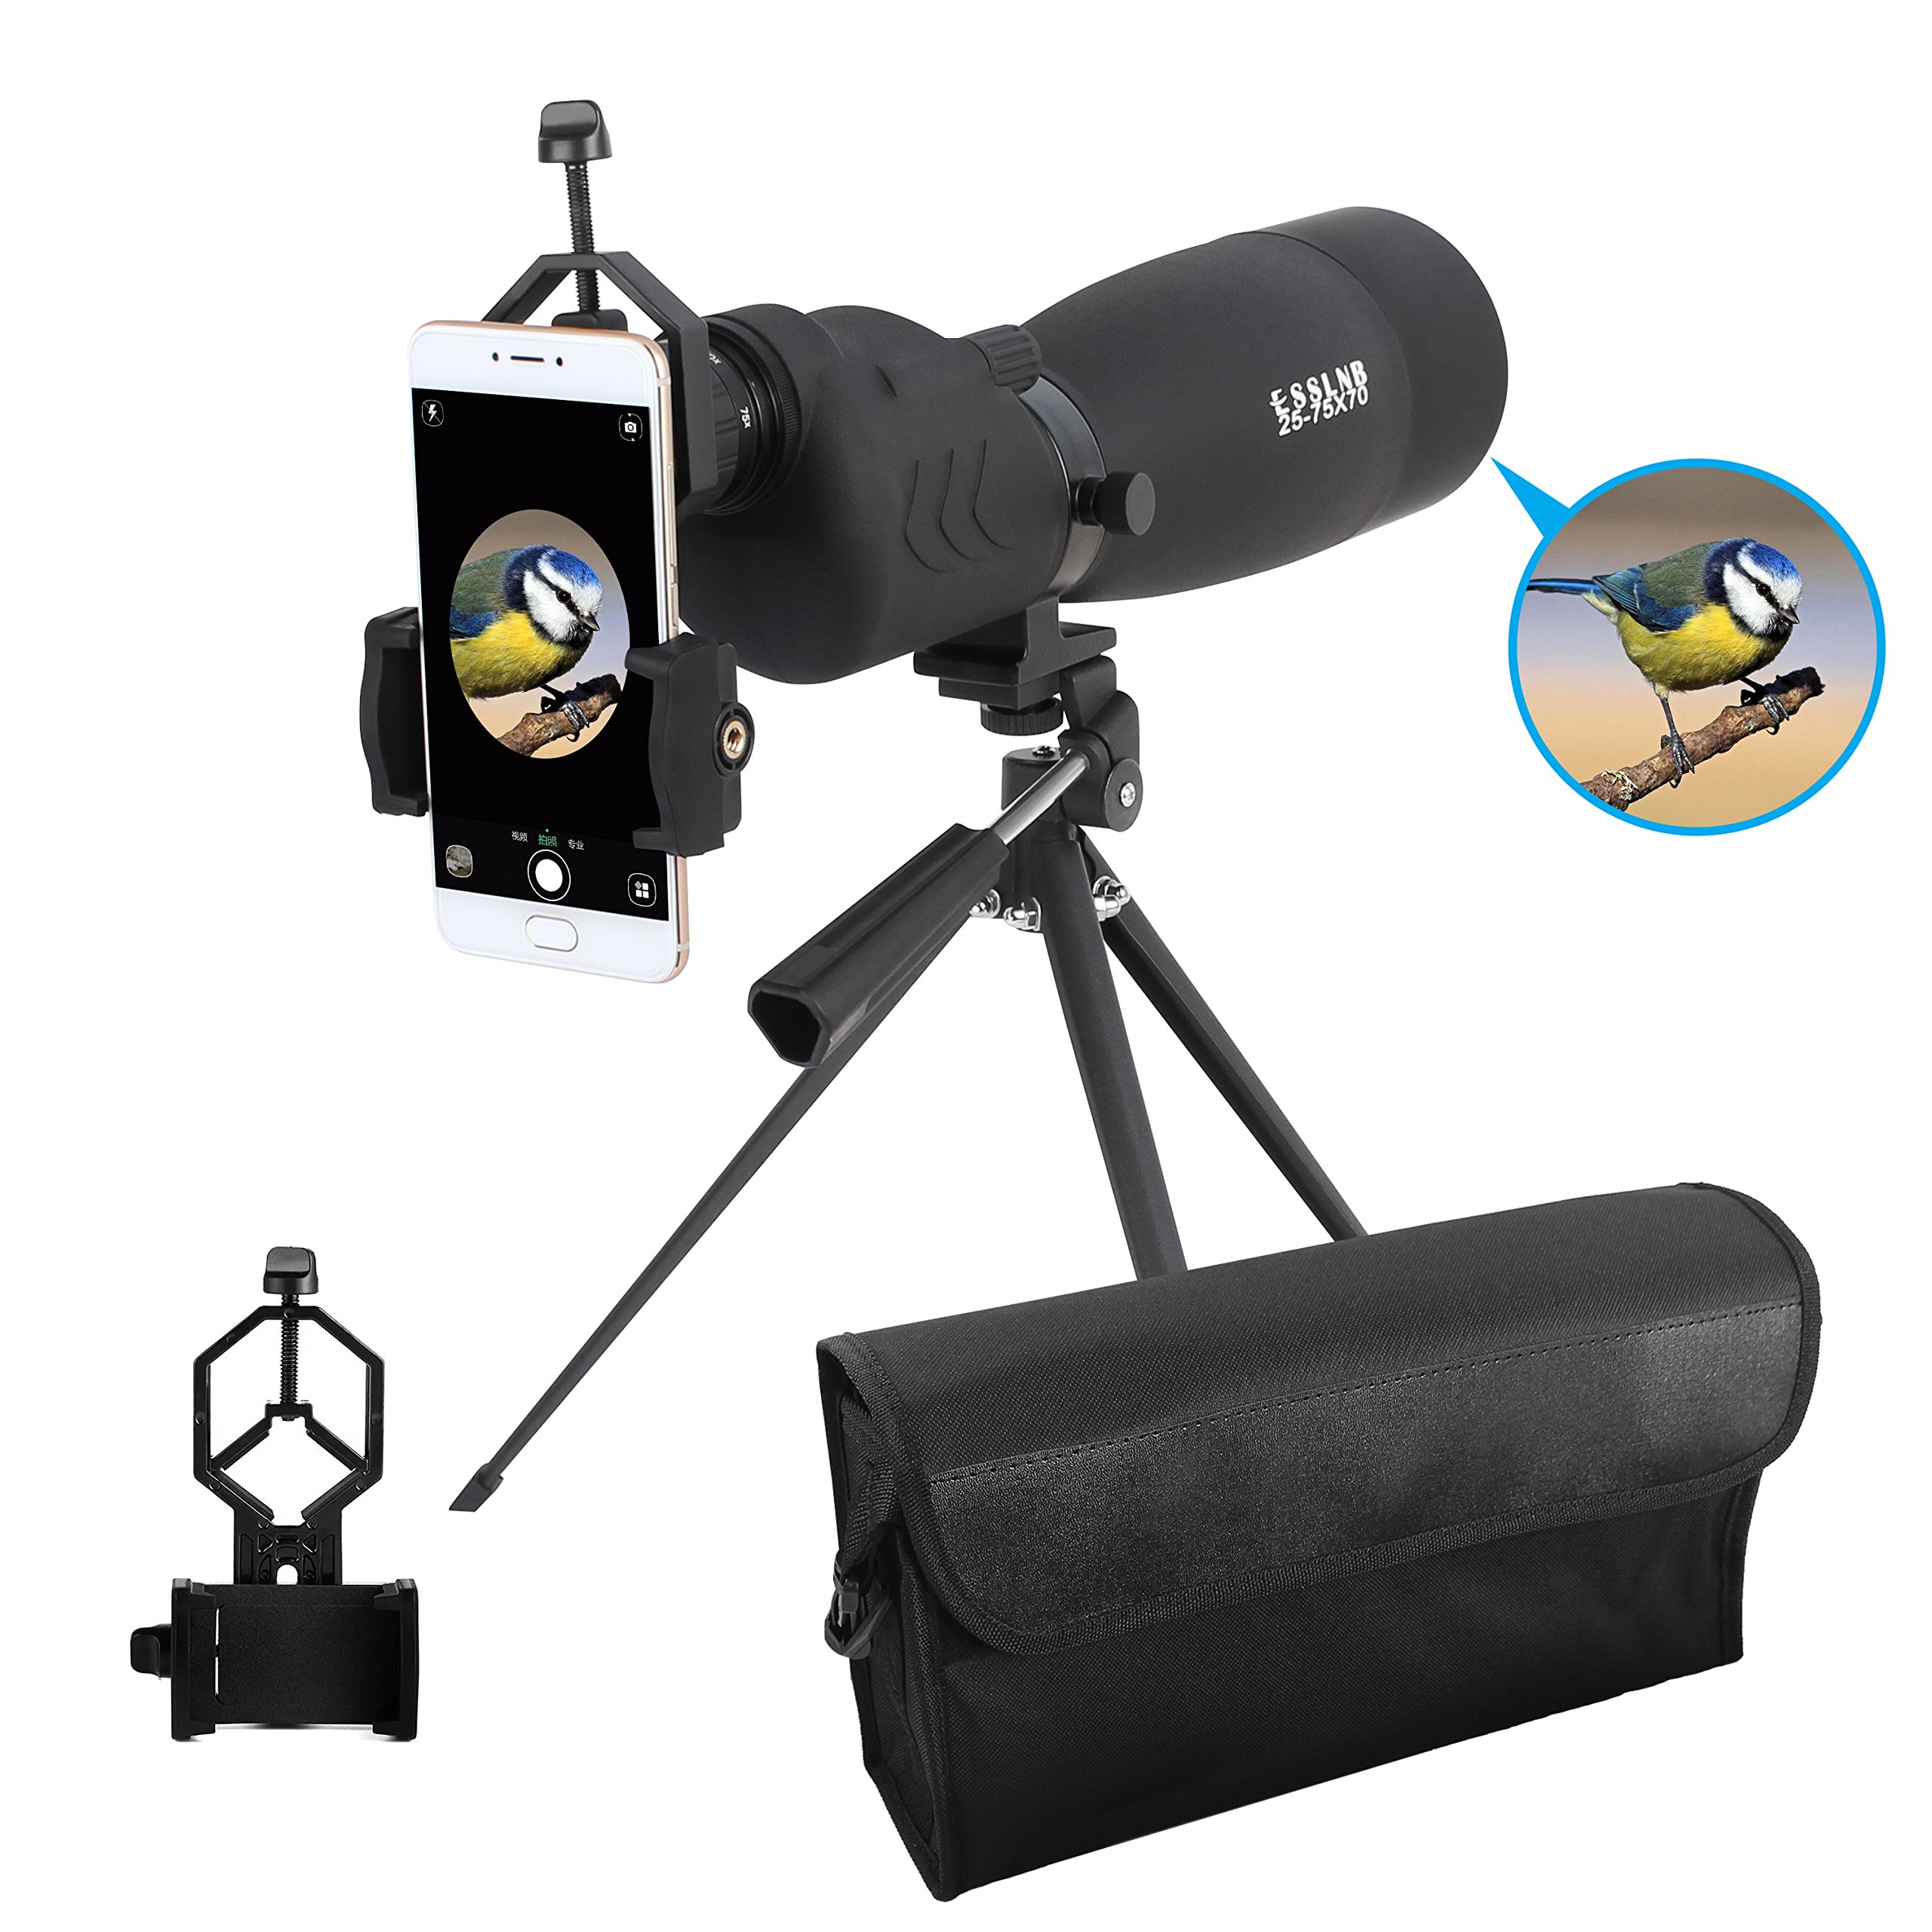 ESSLNB Waterproof Bird Spotting Scope 25-75X70mm with Phone Adapter Tripod and Bag BAK4 Porro Prism Straight Target Scope for Target Shooting Bird Watching Hunting